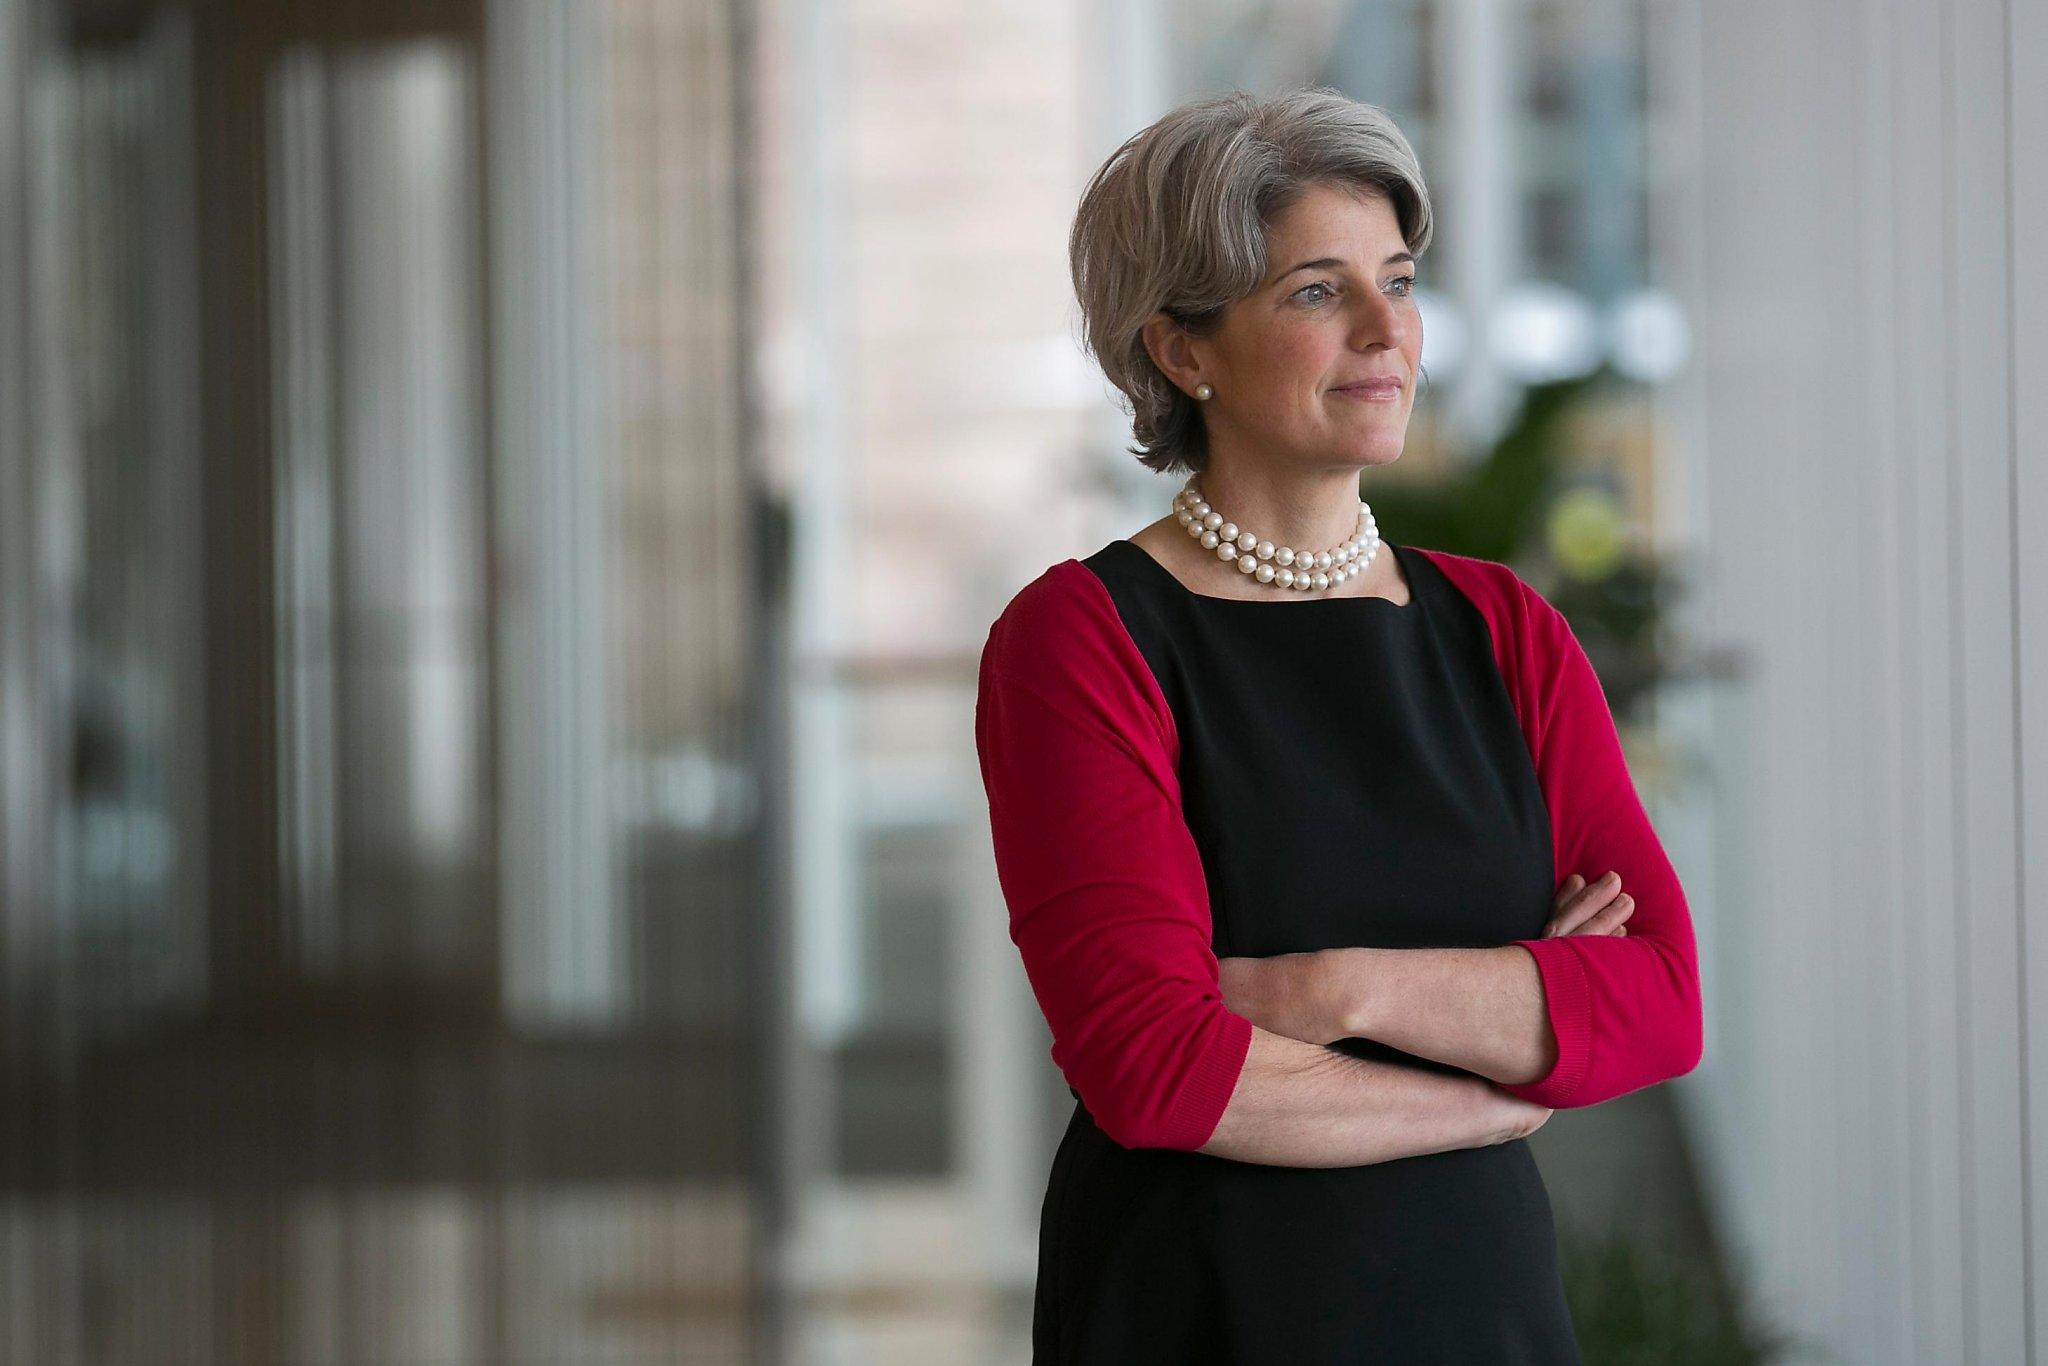 Some women attain an enviable status: 401(k) millionaire